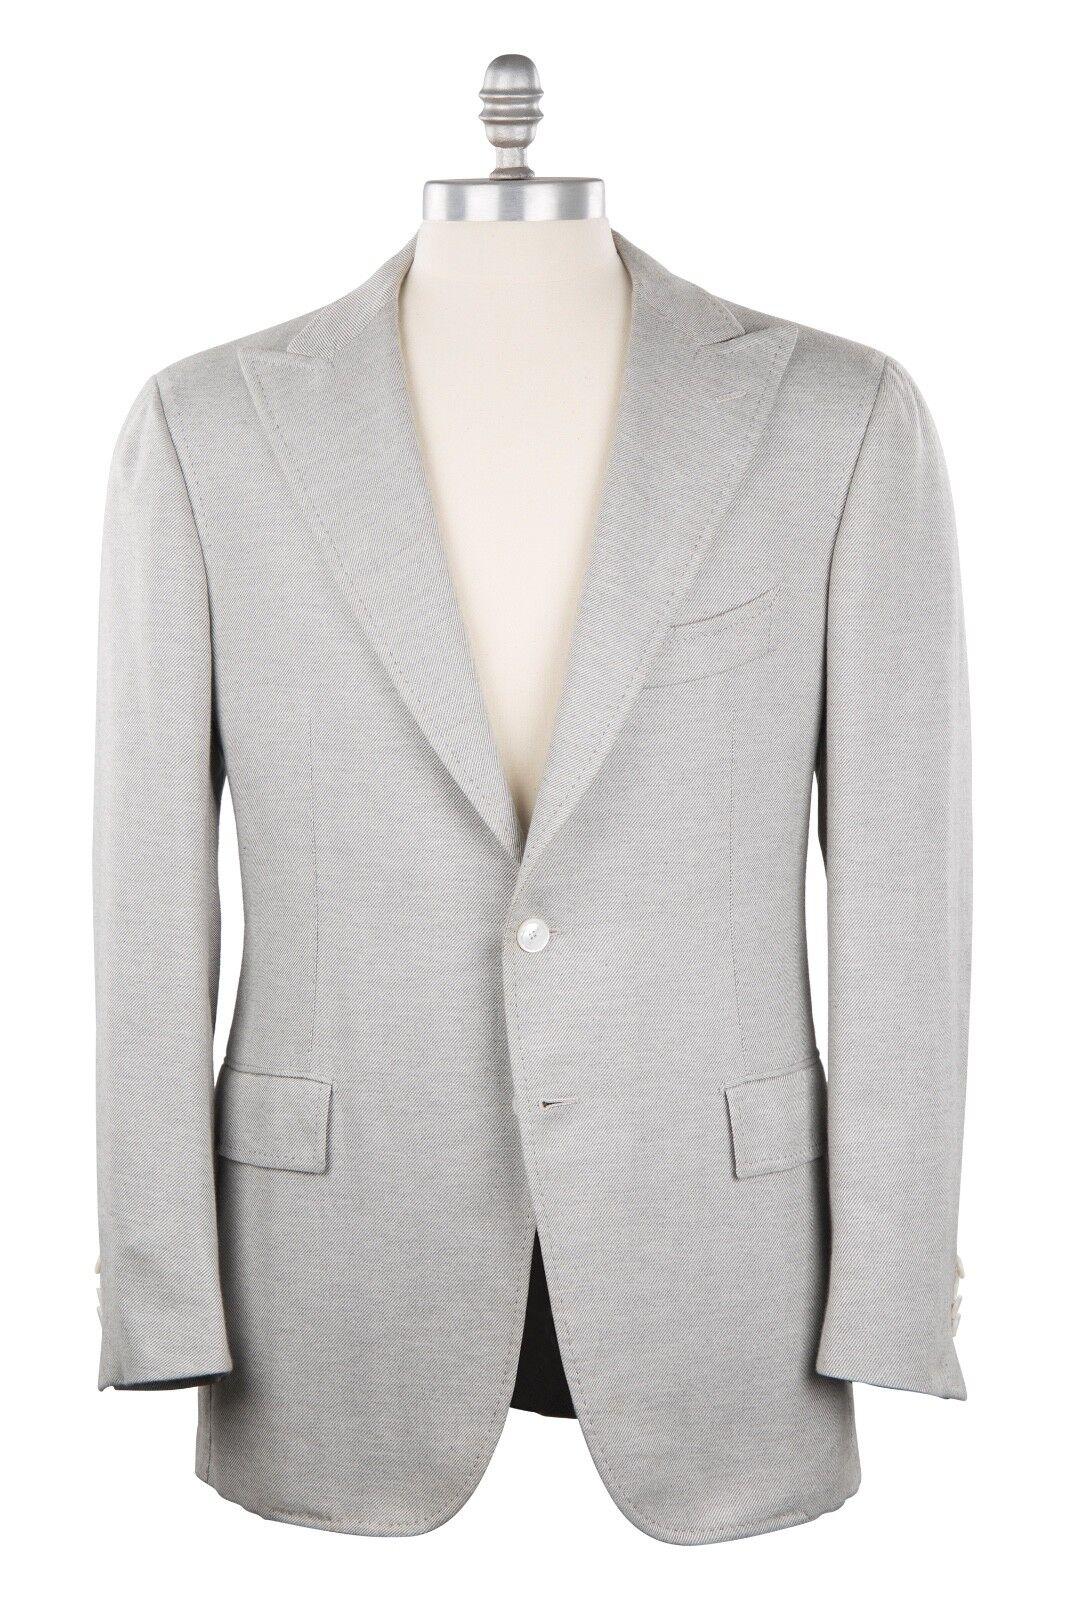 Cesare Attolini Sea Island Cotton 40US/50EU Sport Coat Light grau Twill